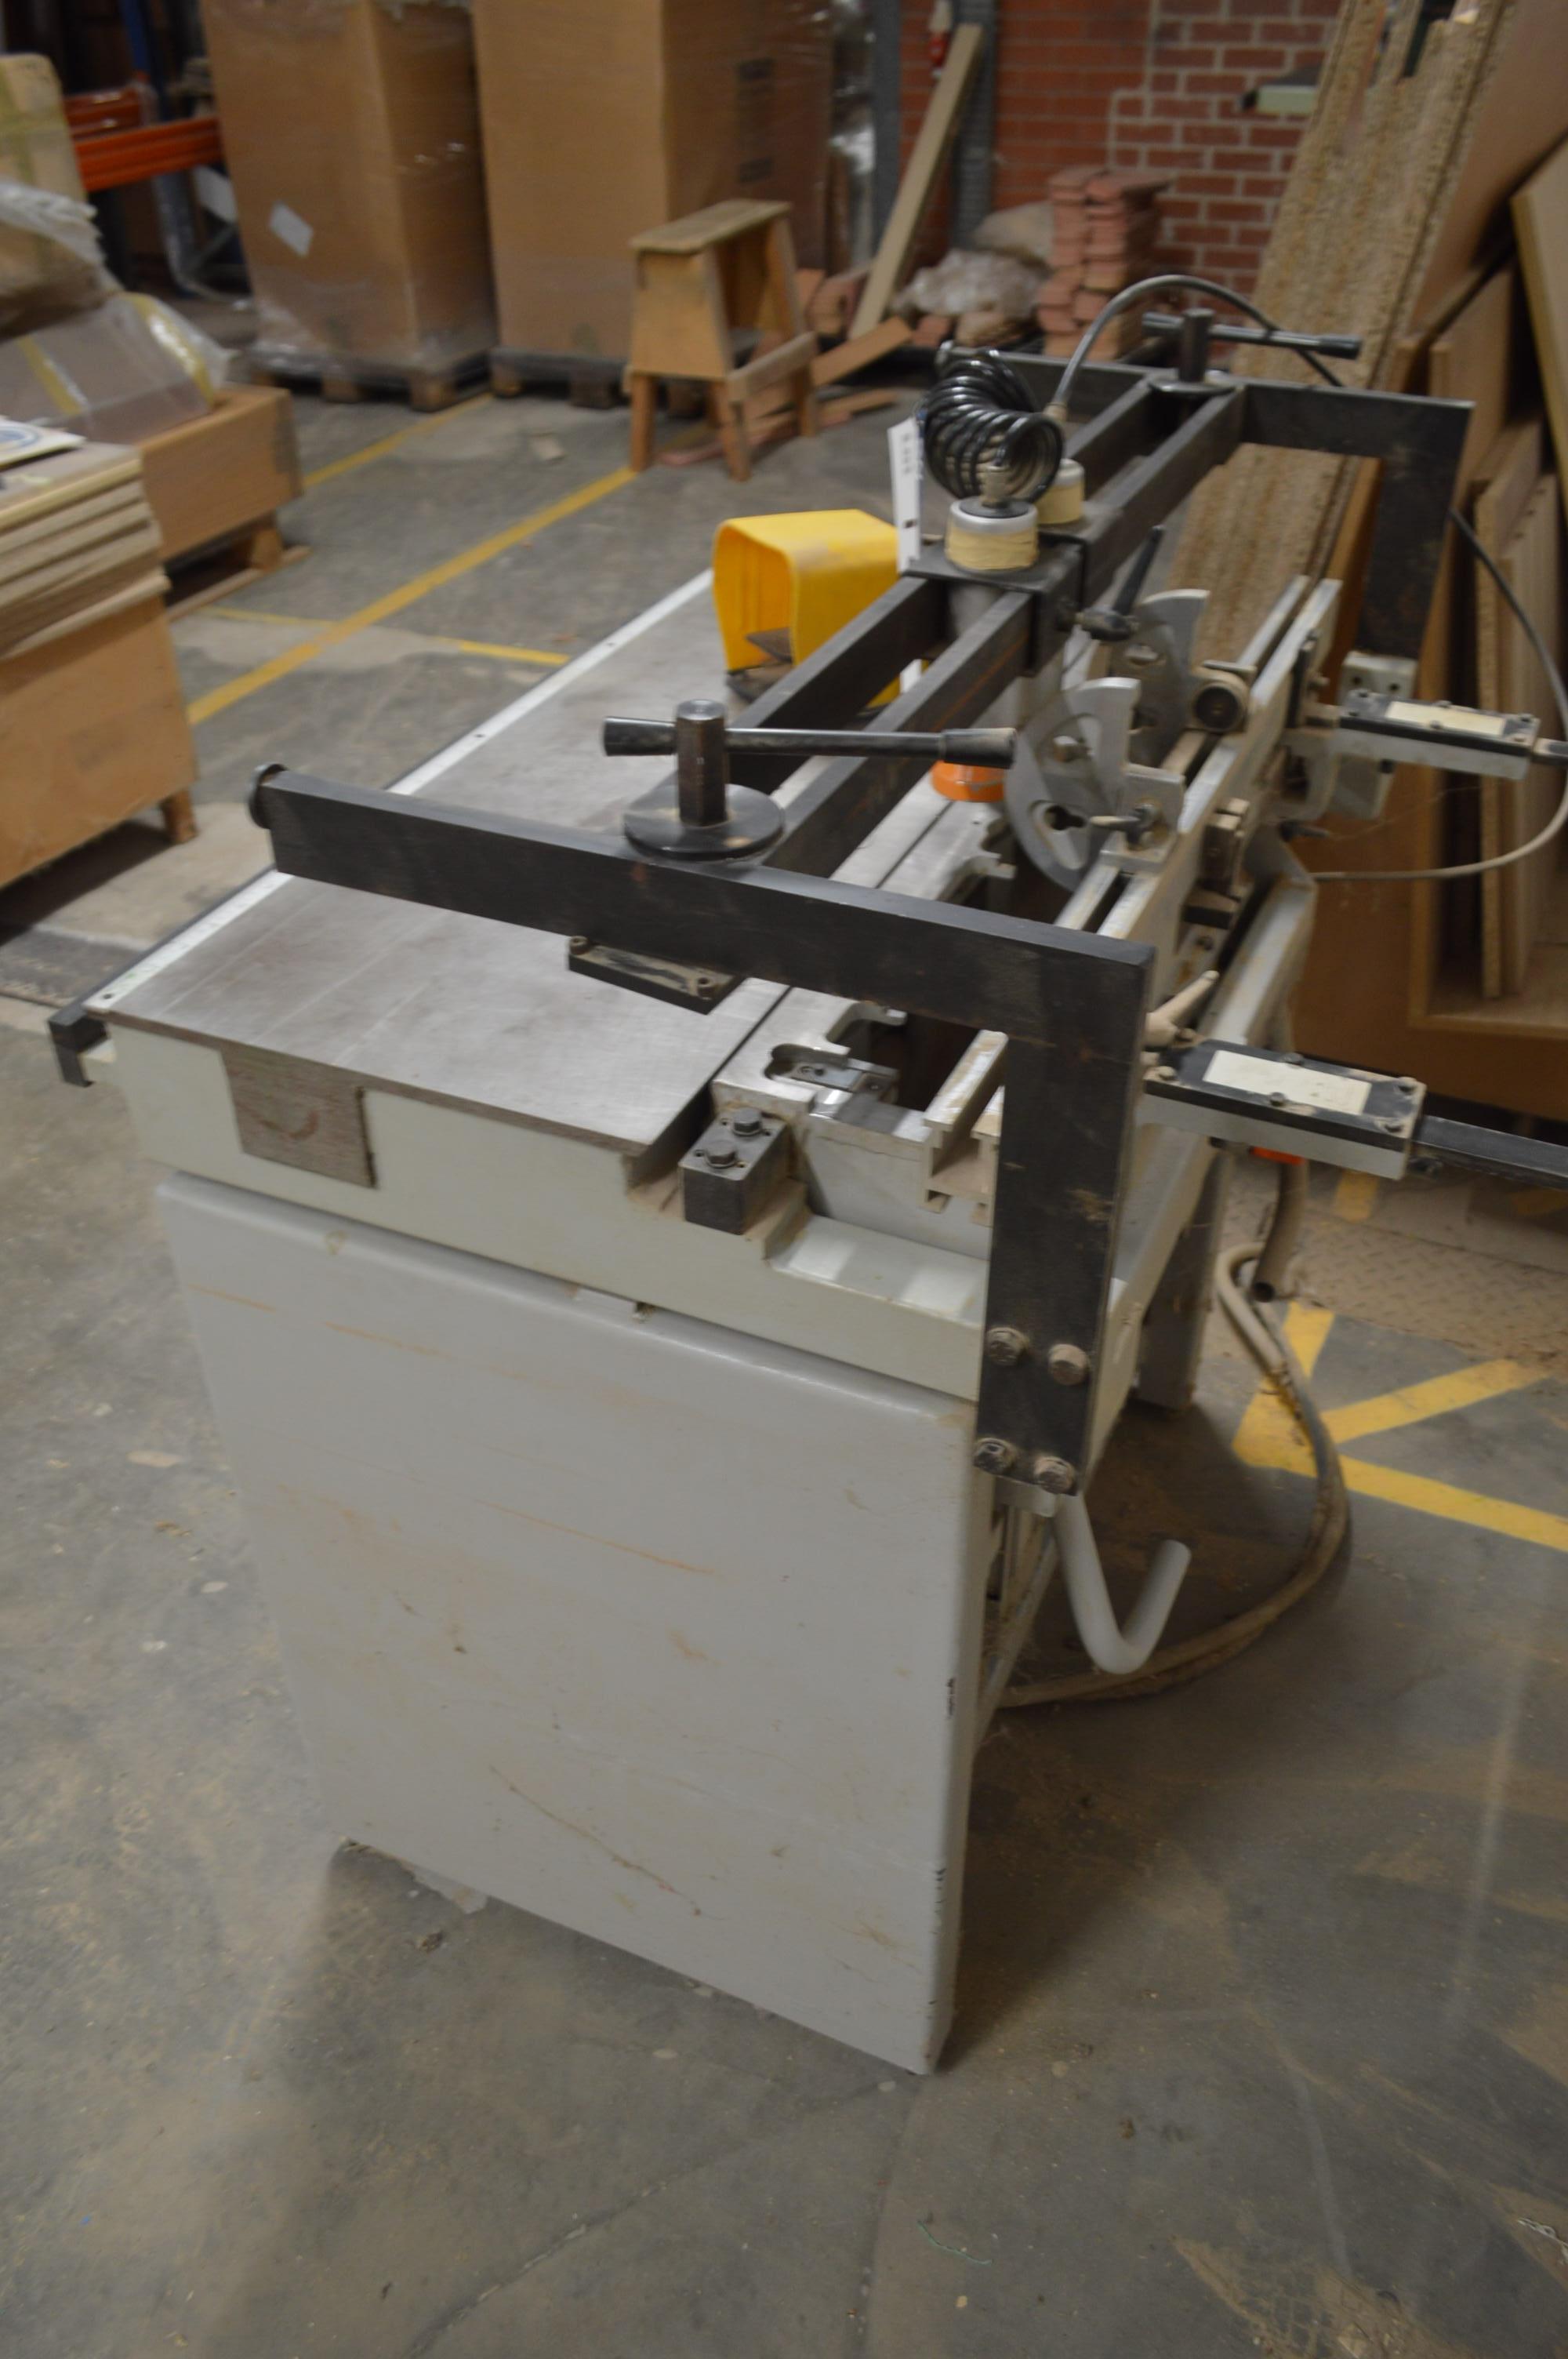 Lot 16 - Me.Sa Type GT M21 Multi-Borer, serial no. 0695032,